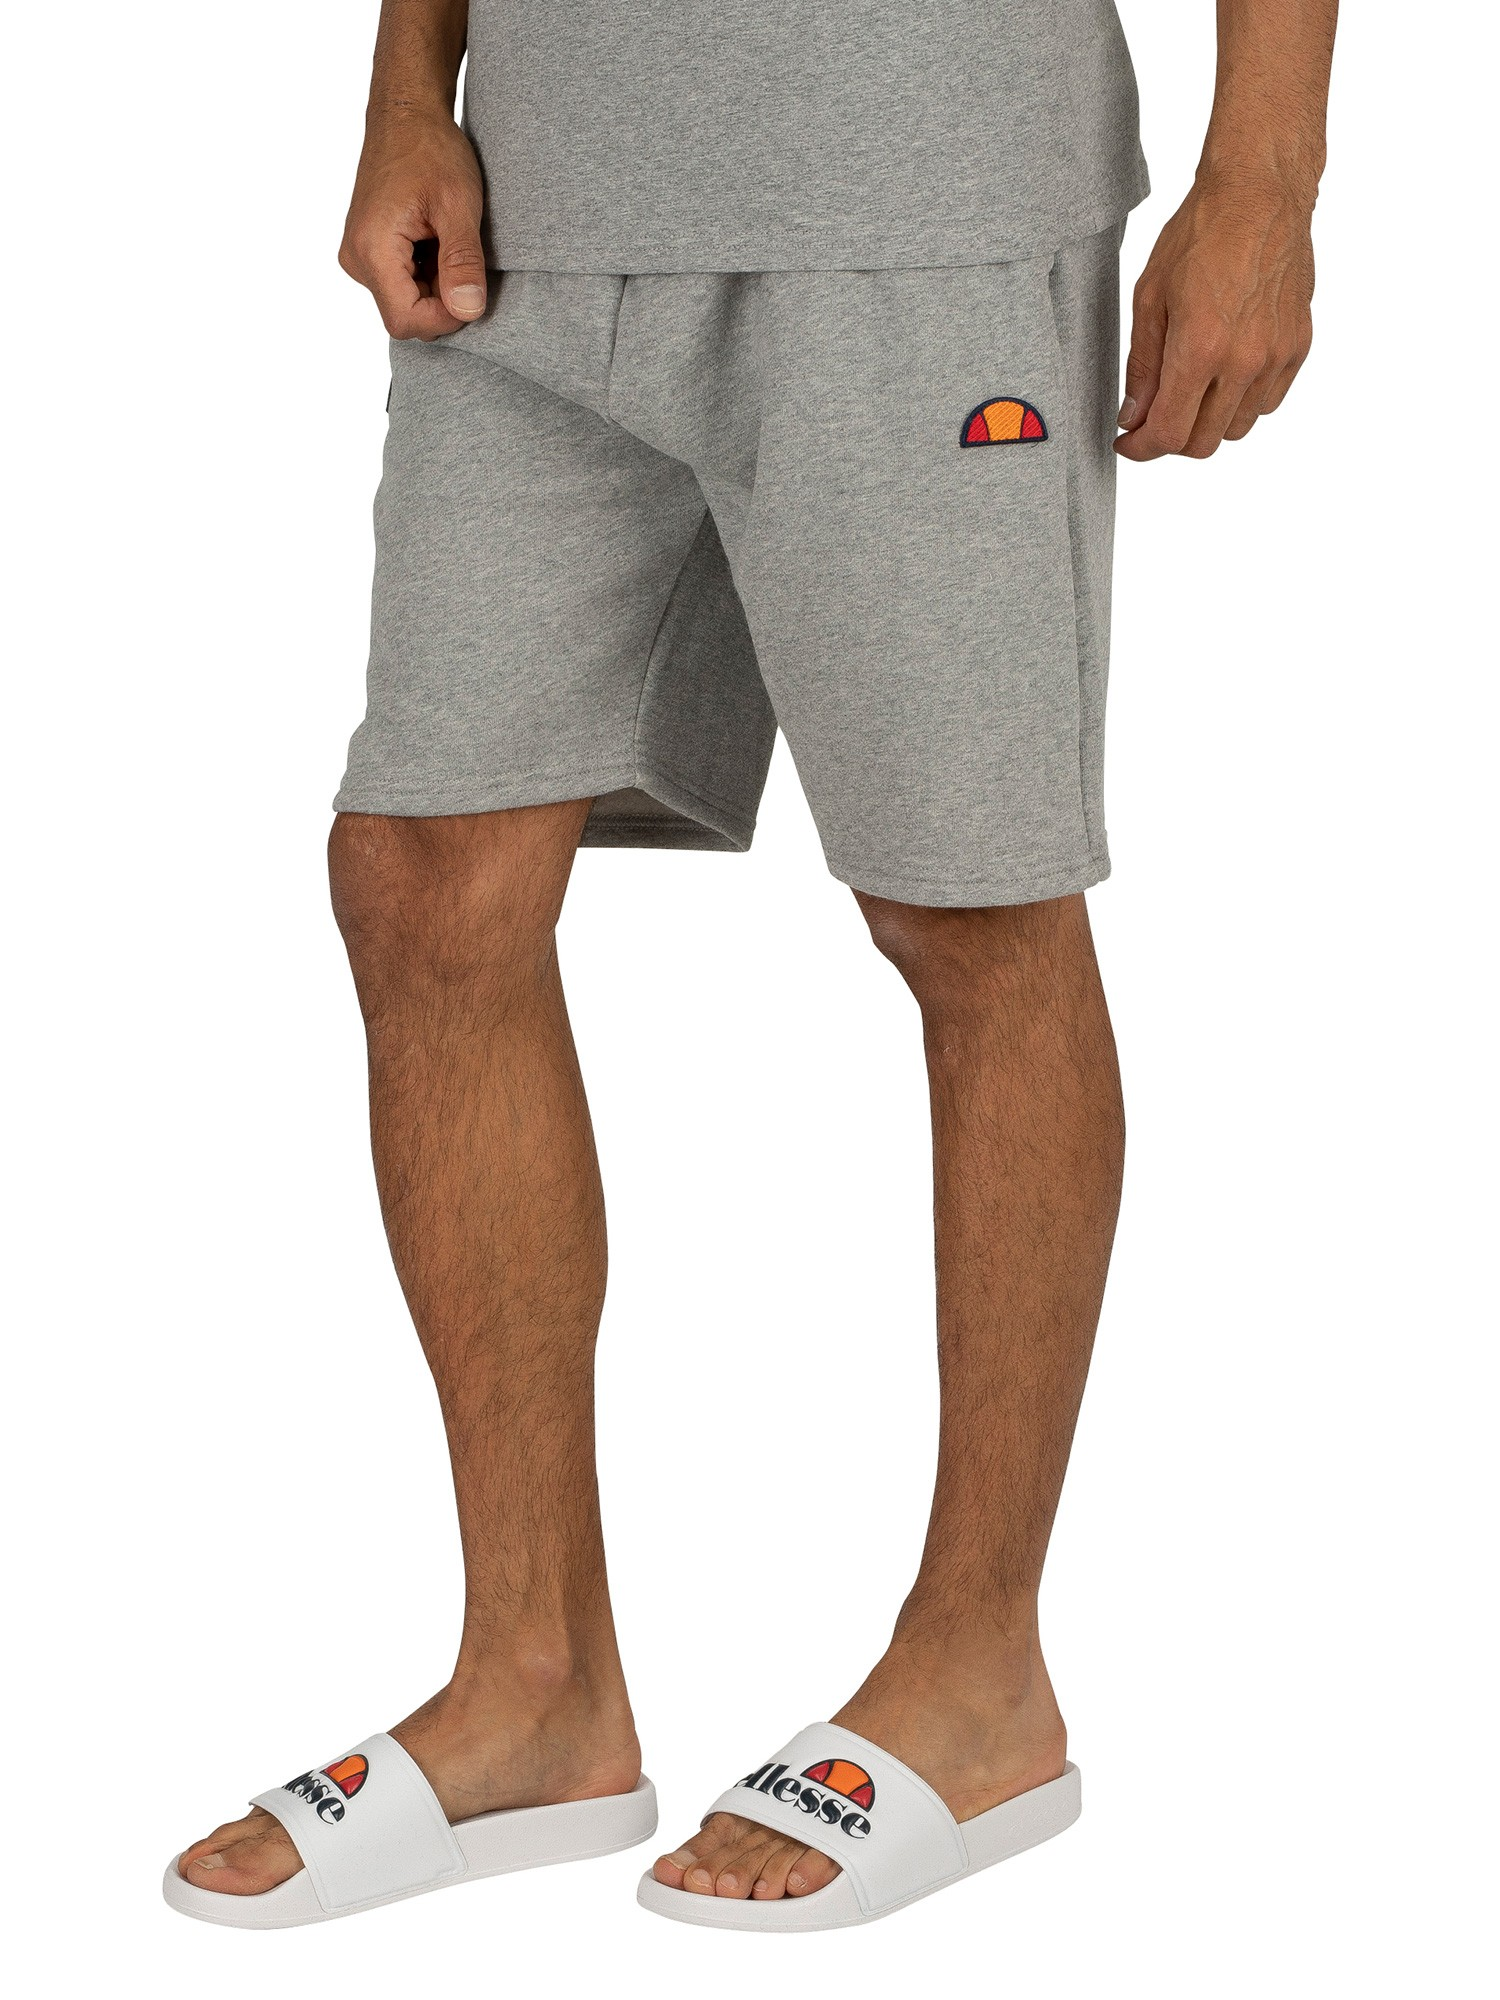 Noli Fleece Sweat Shorts